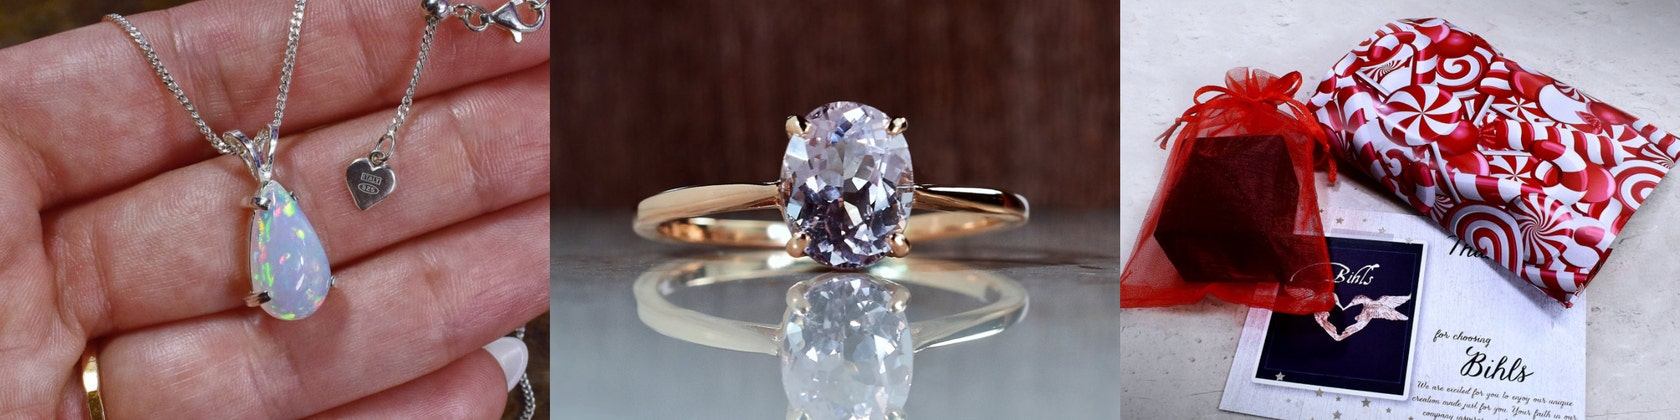 14Kt Or Rose Opale /& Diamant Trillion Collier Pendentif